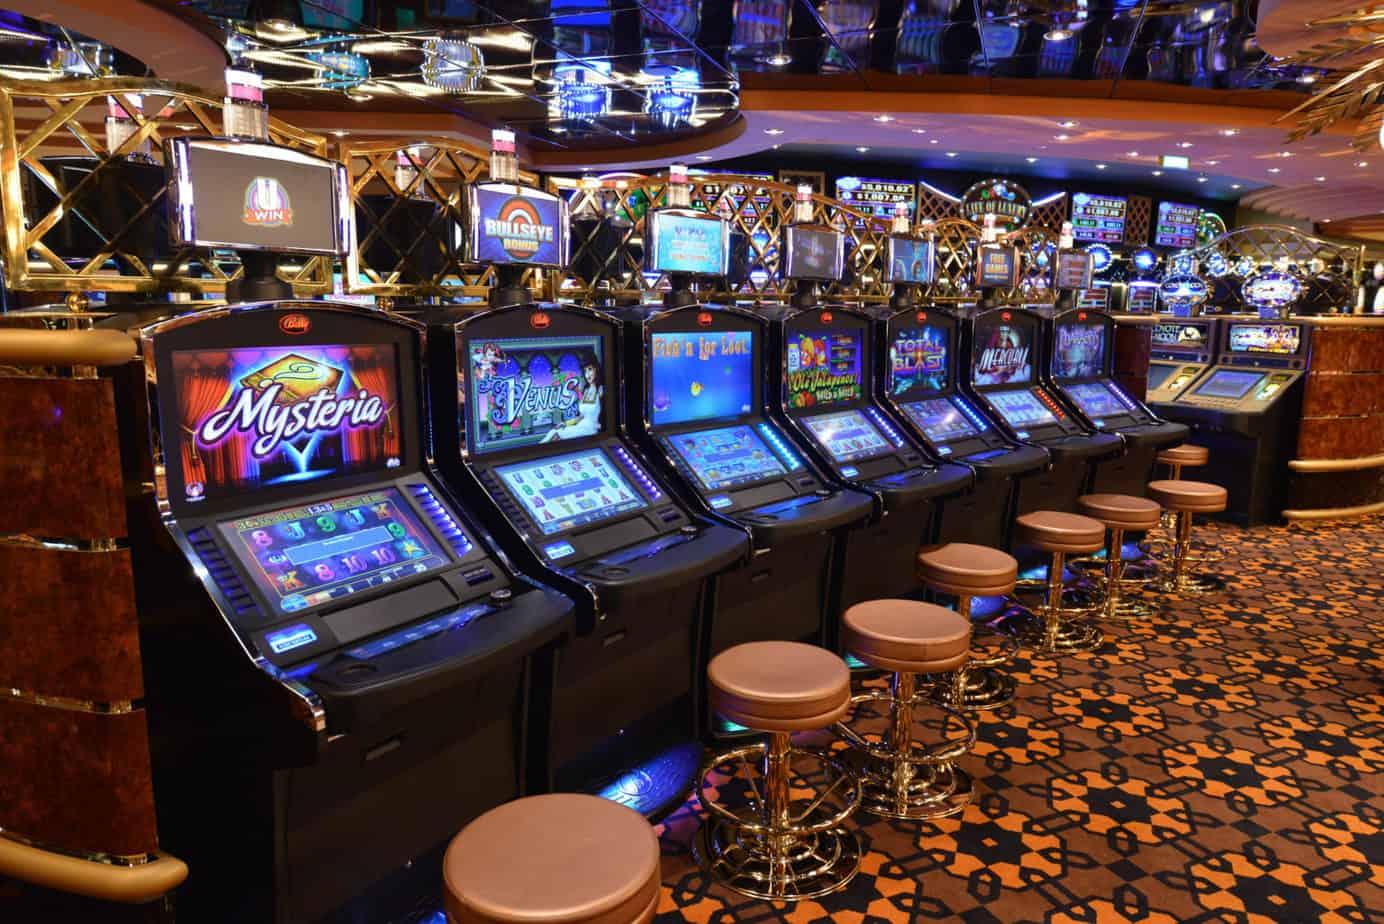 Royal ace casino no deposit codes 2019